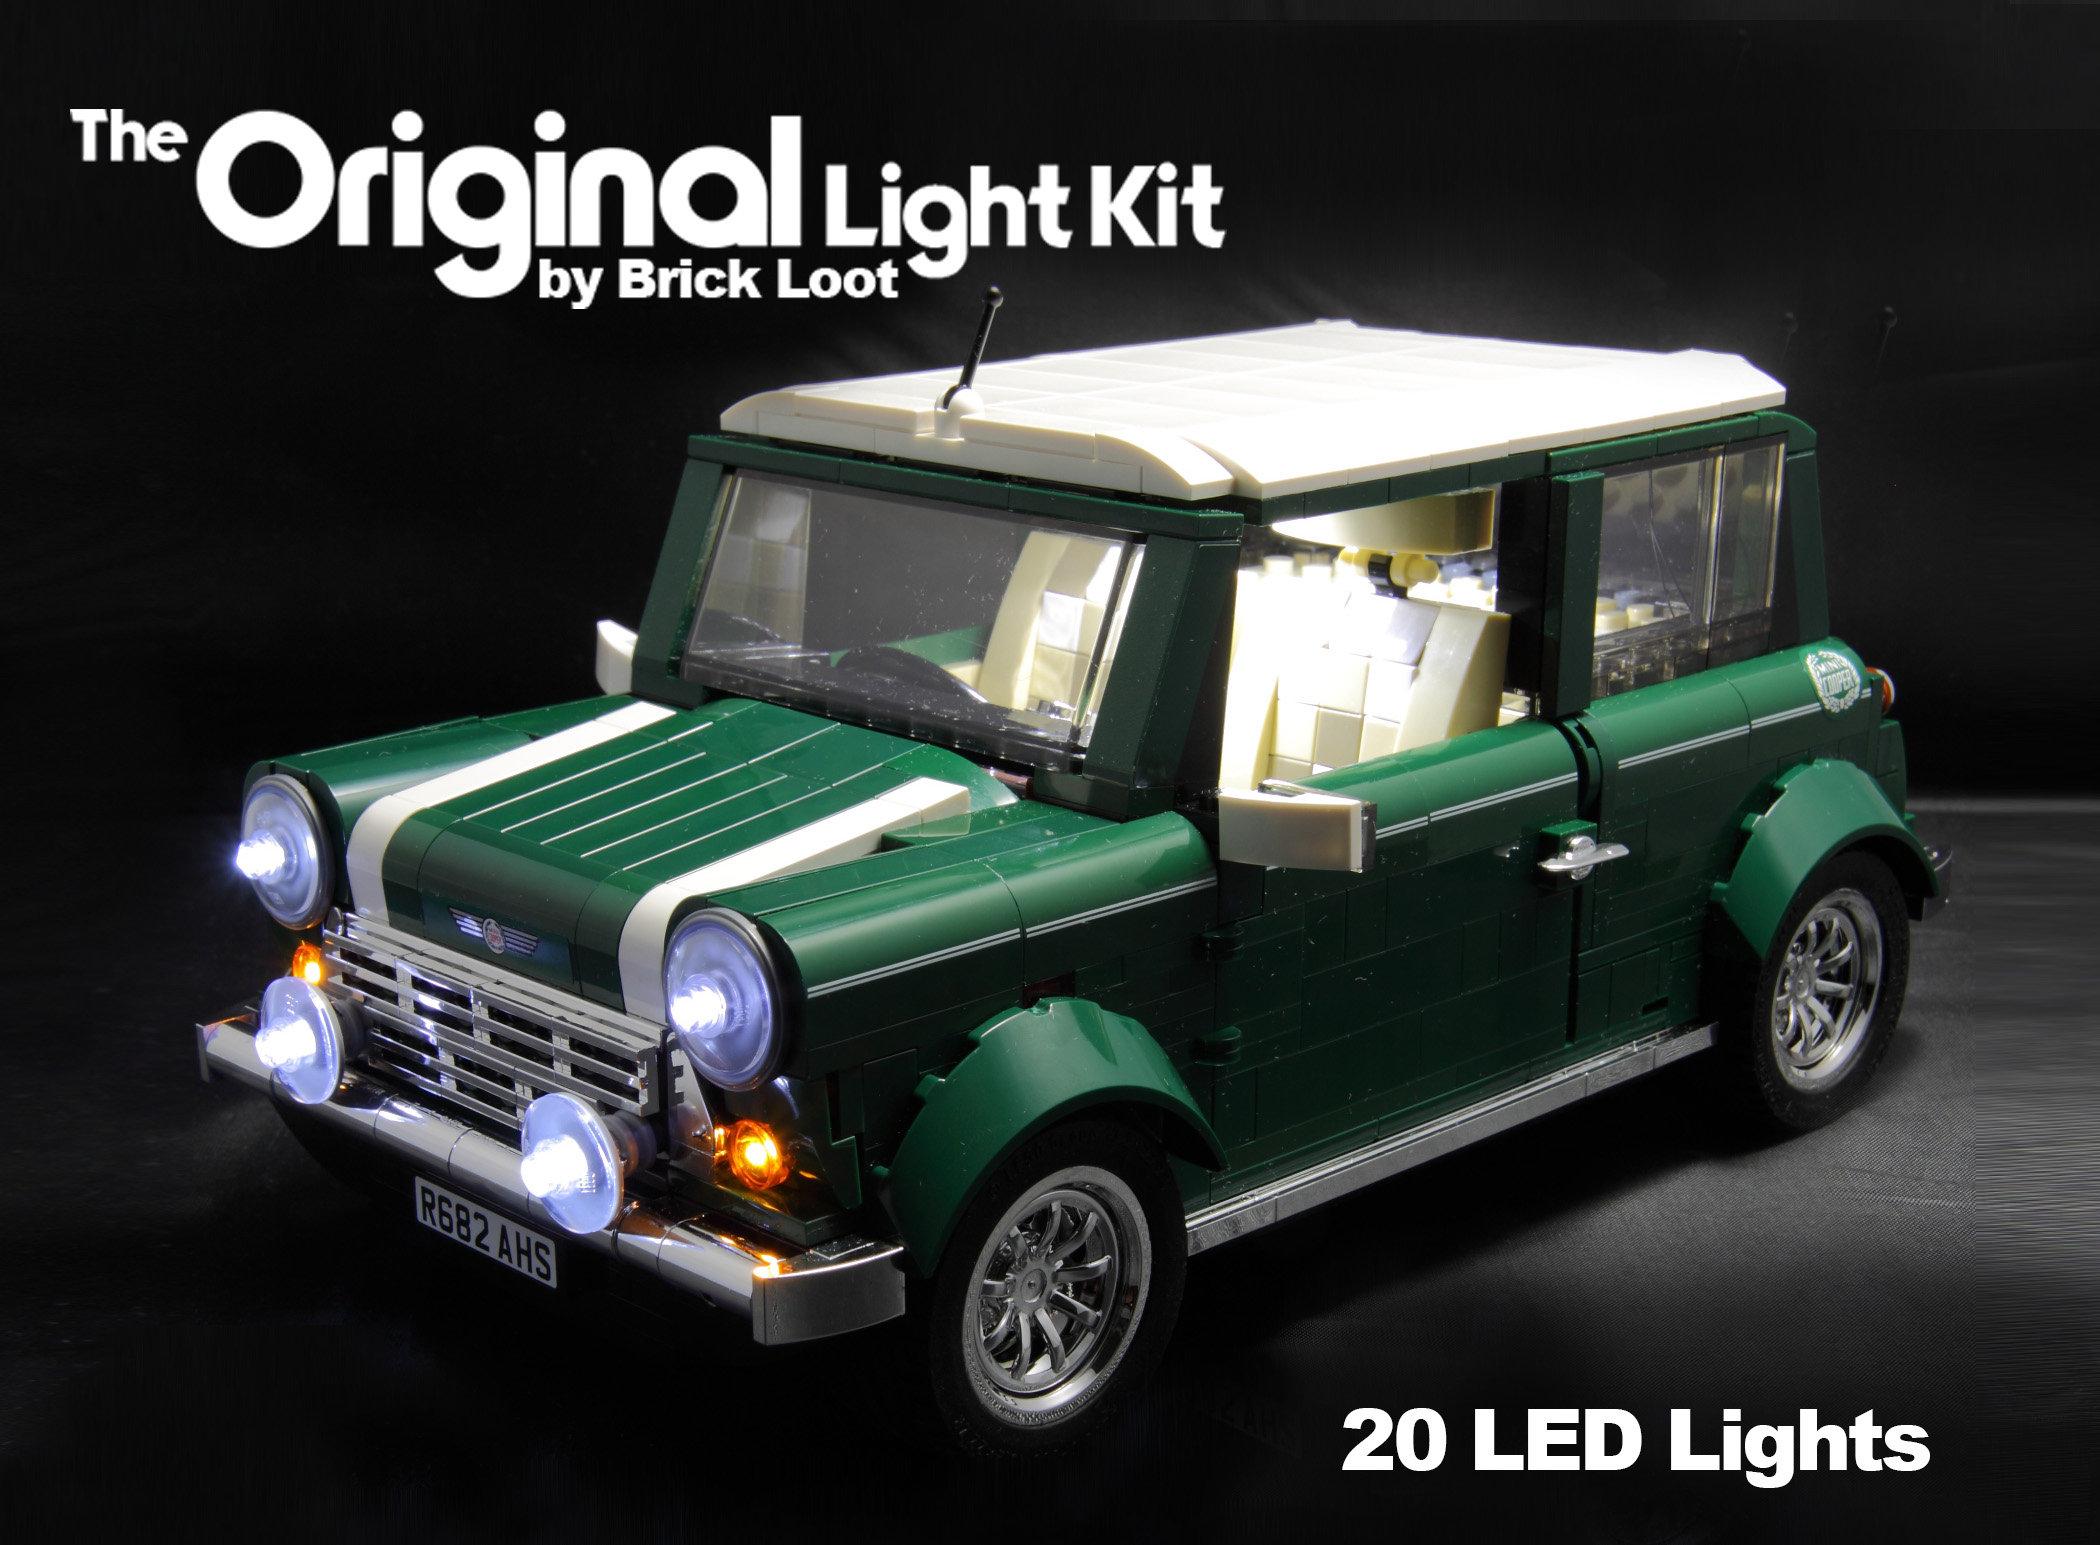 led lighting kit for lego 10242 mini cooper etsy. Black Bedroom Furniture Sets. Home Design Ideas